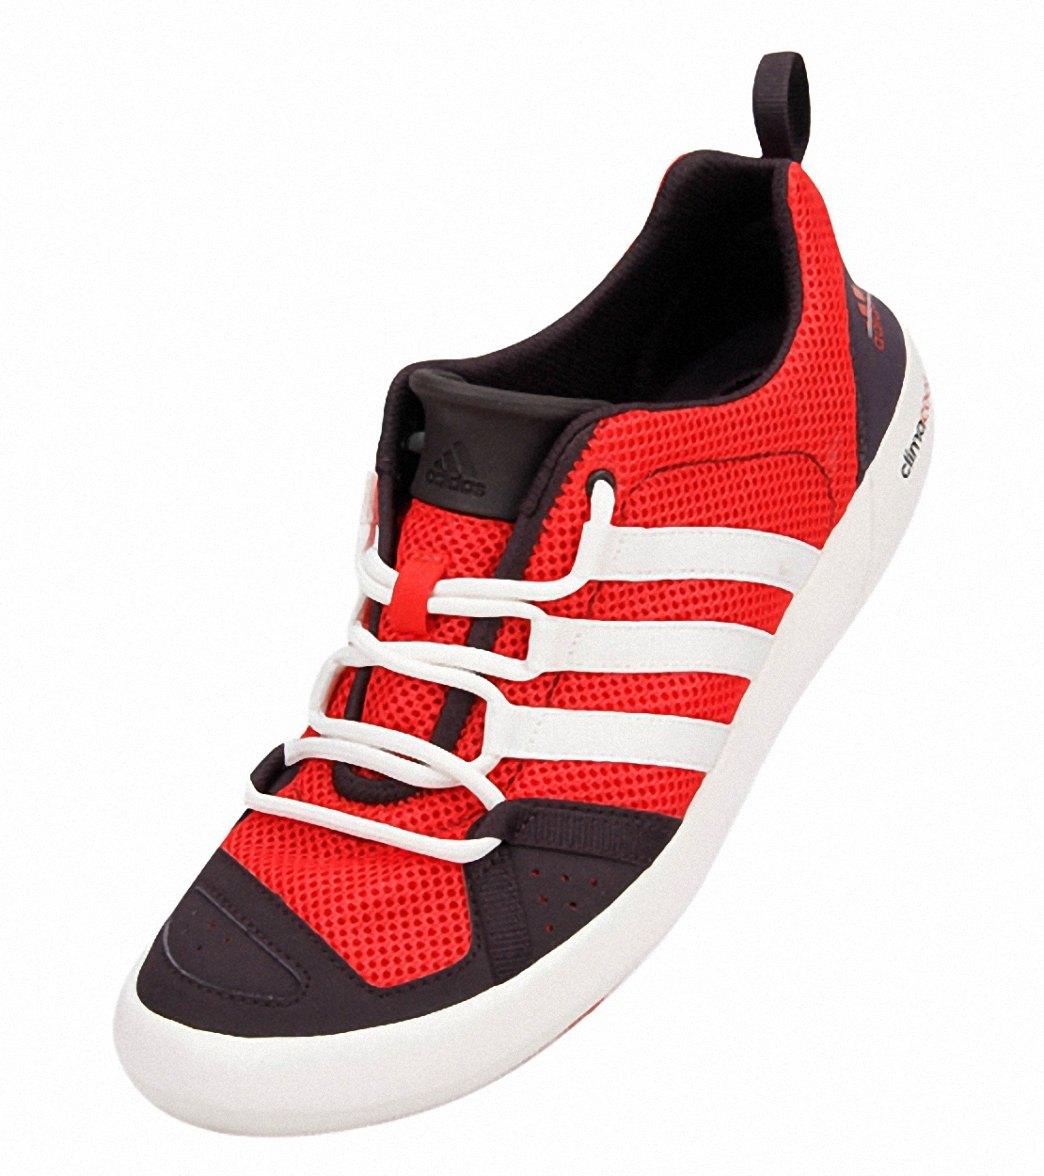 super popular ae40a 33e0d Adidas Men s Boat CC Lace Water Shoes